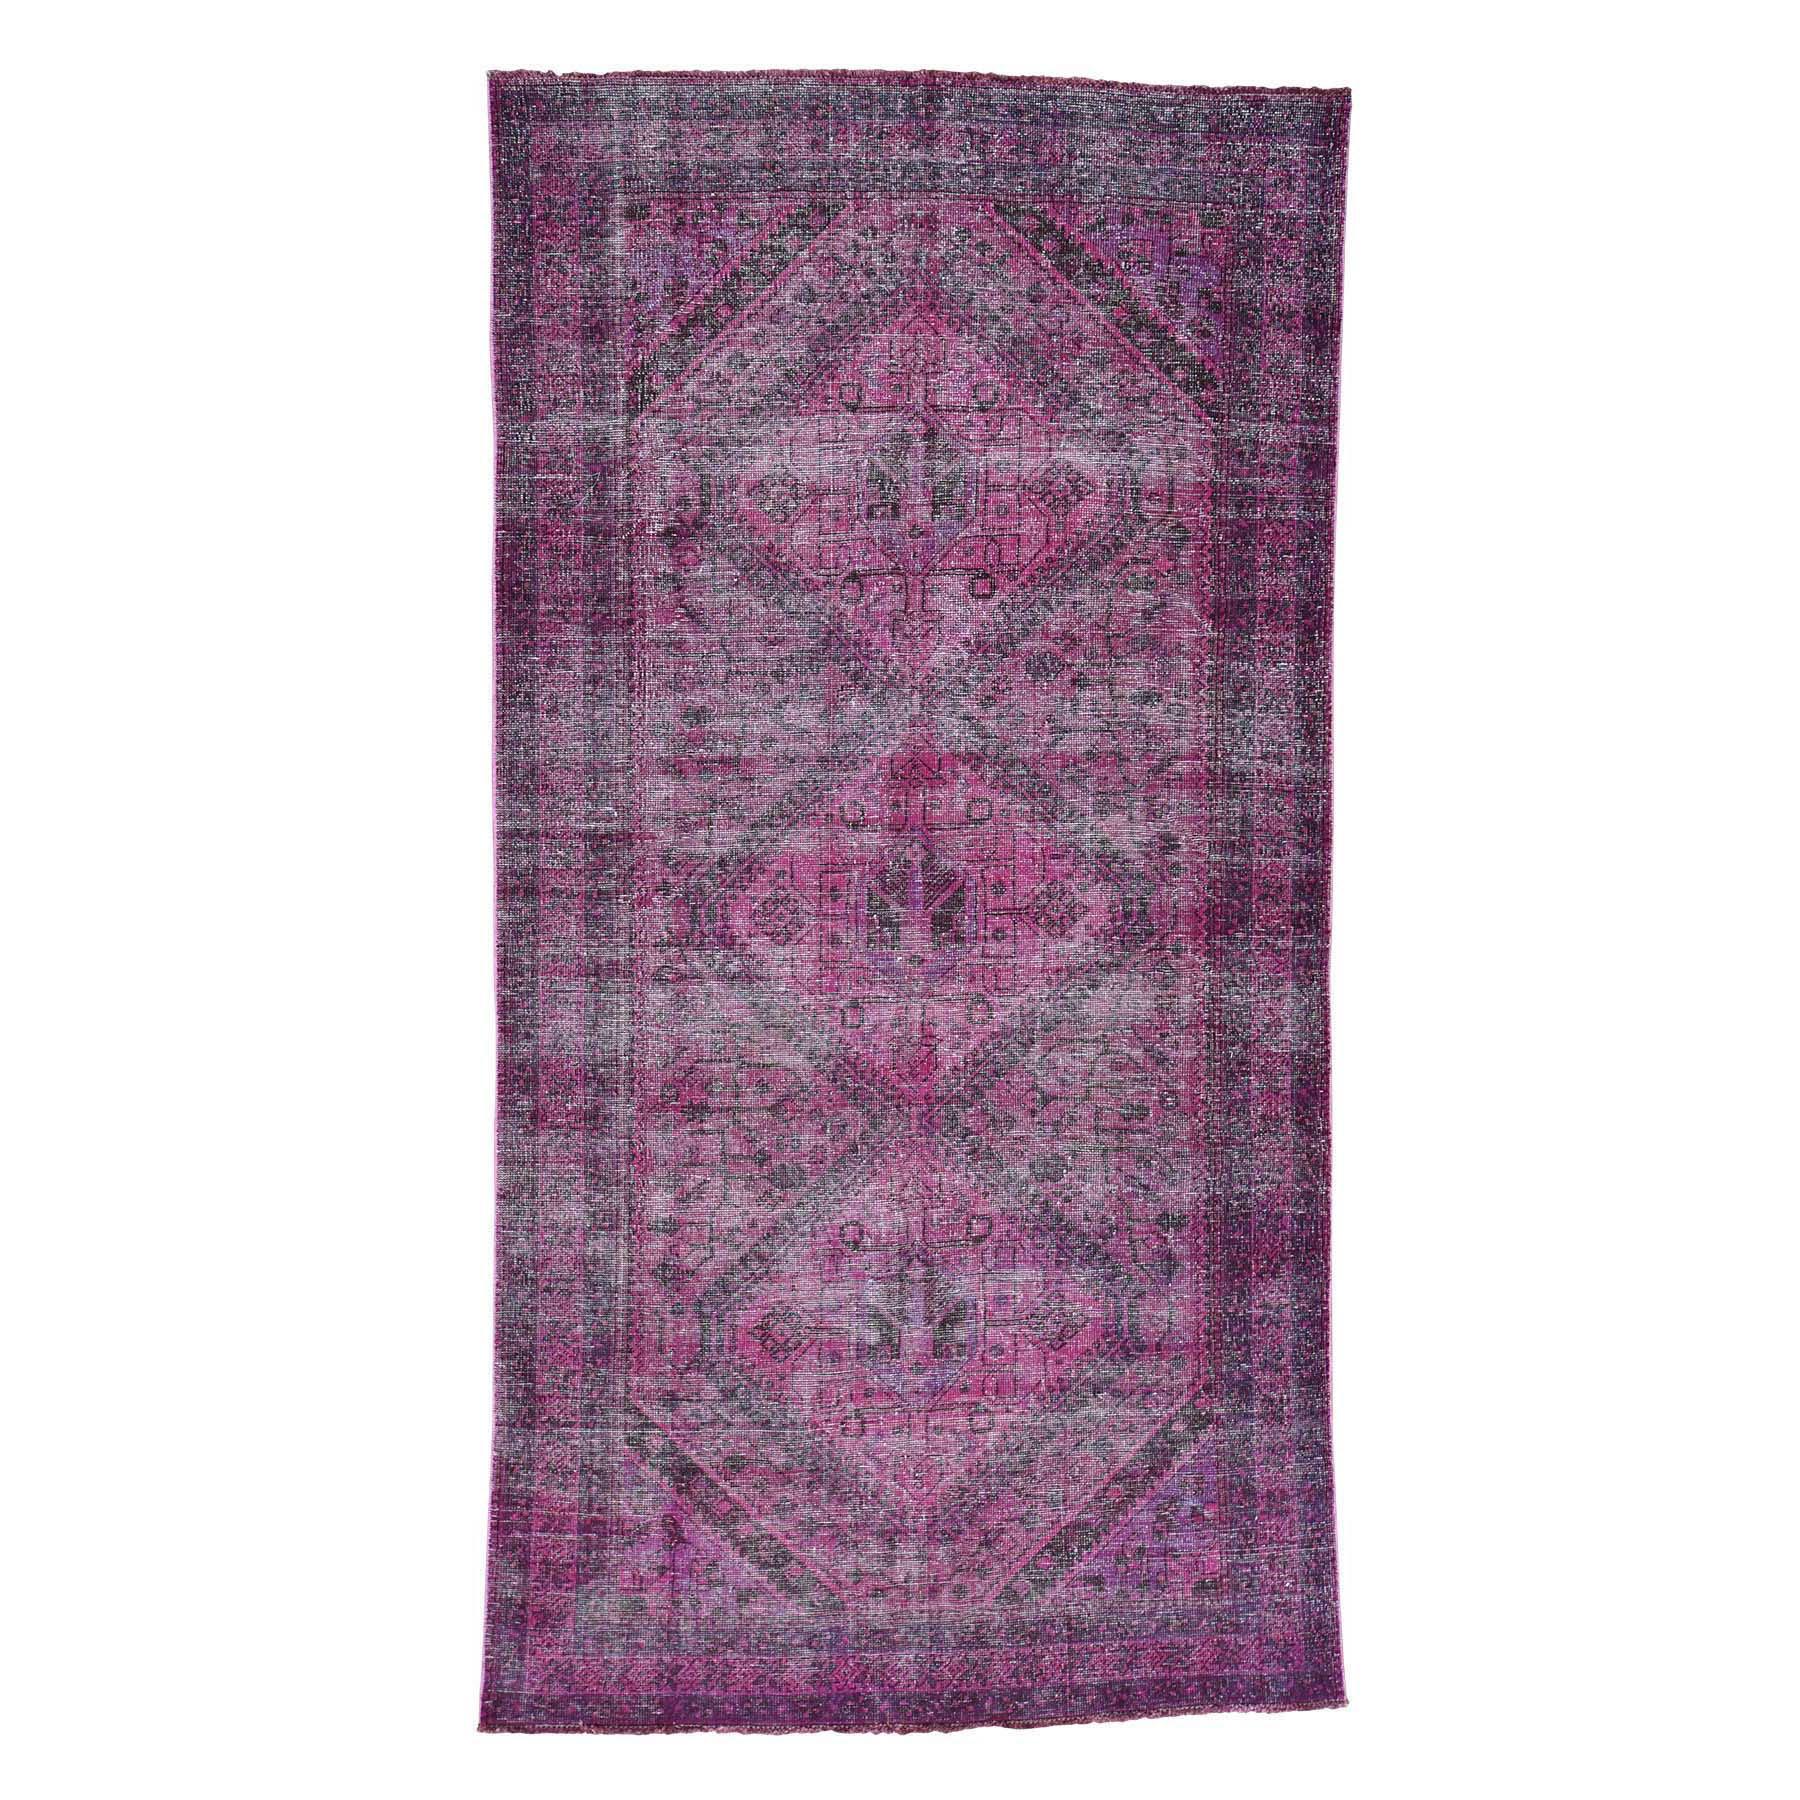 "5'3""X9'8"" Handmade Overdyed Persian Shiraz Vintage Wide Runner Rug moacd8a8"